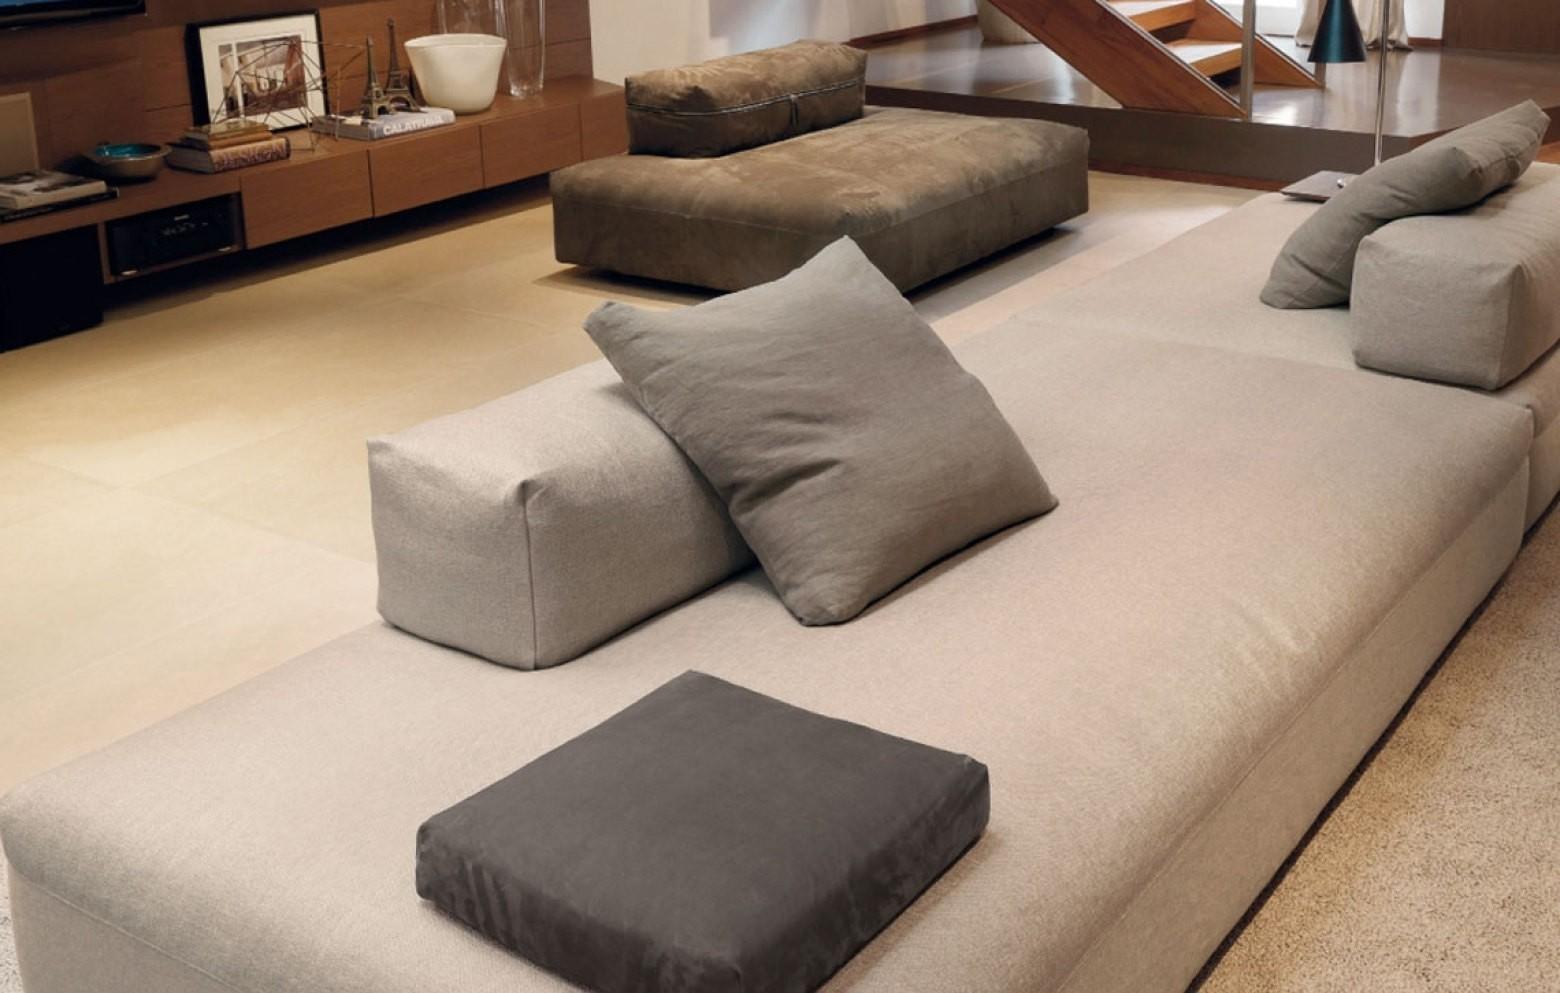 monopoli ecksofas polsterm bel who 39 s perfect. Black Bedroom Furniture Sets. Home Design Ideas